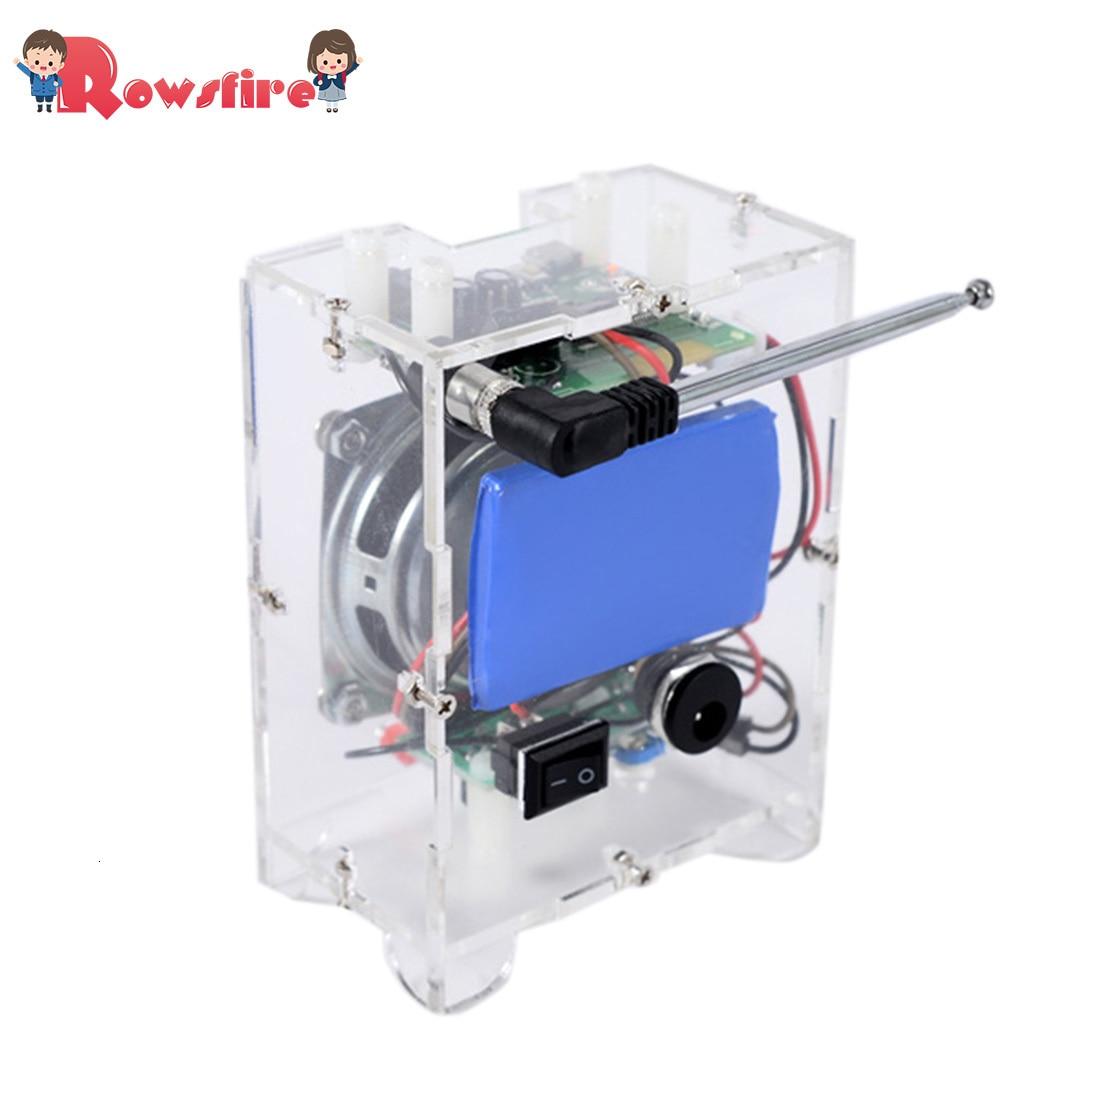 DIY Mini Speaker Kit MP3 Small Speaker Sound Amplifier With Remote Control - Ordinary Version